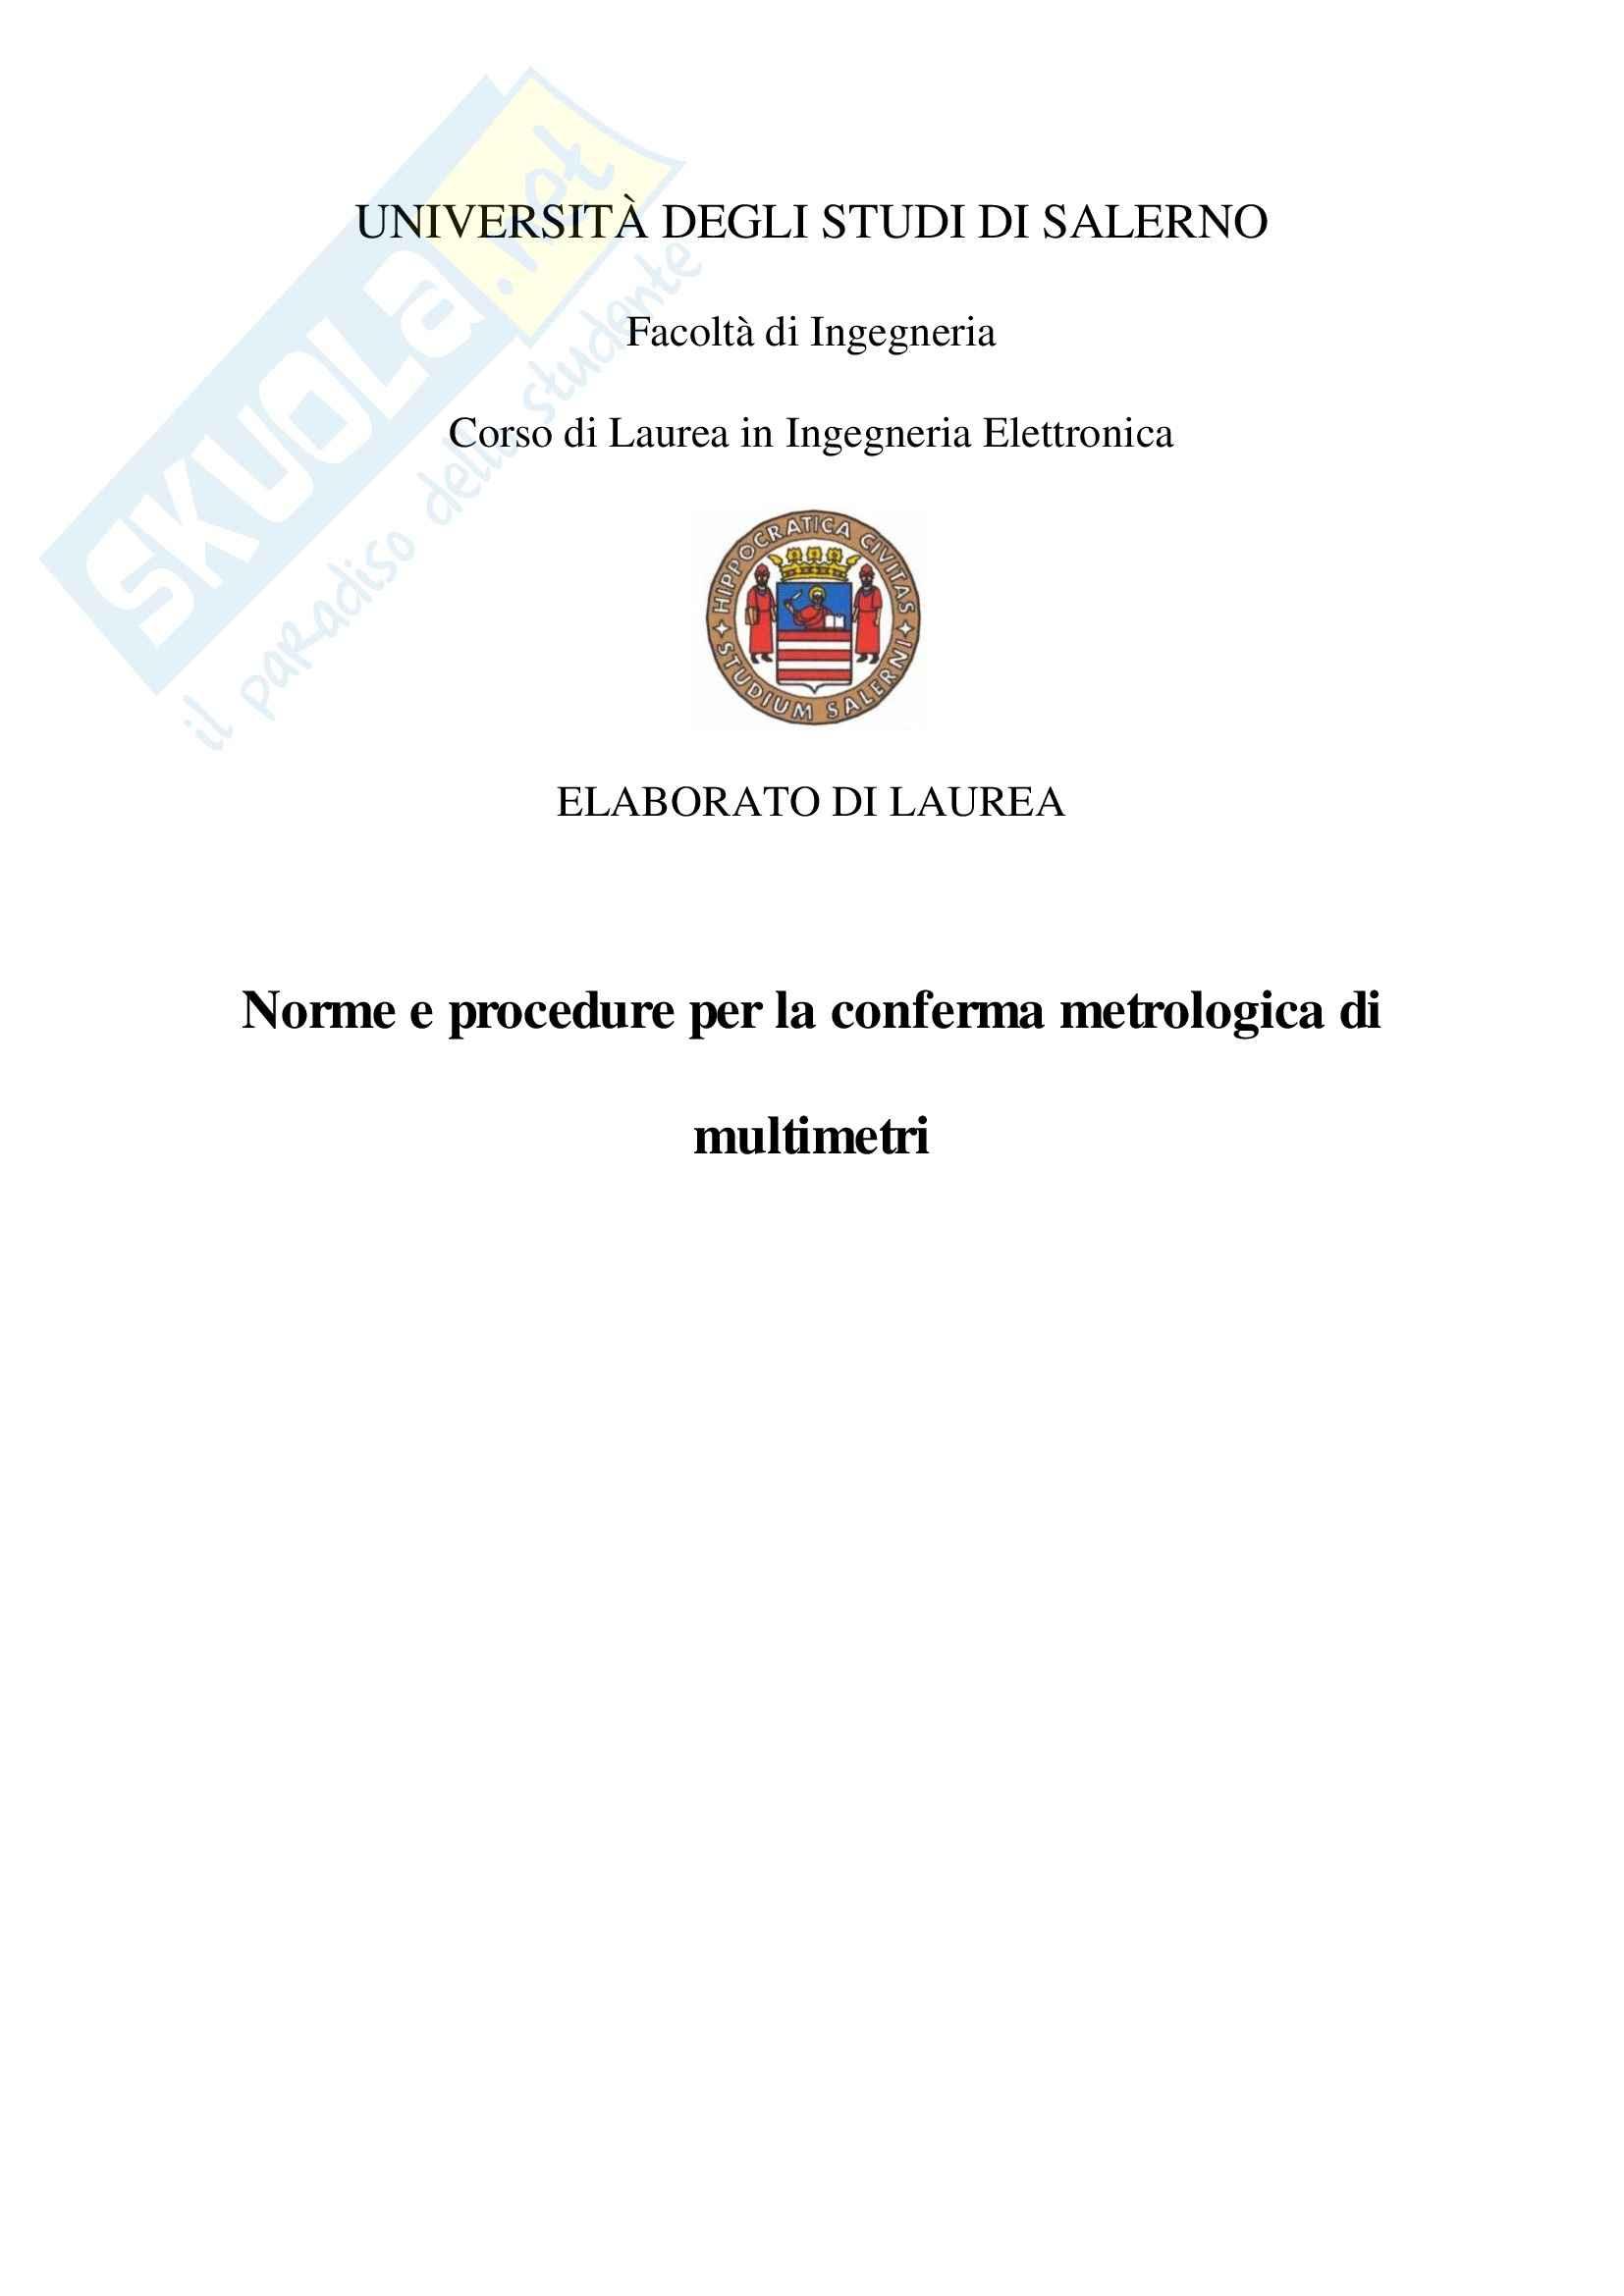 Tesi sperimentale Misure Elettroniche - Conferma metrologica Multimetro